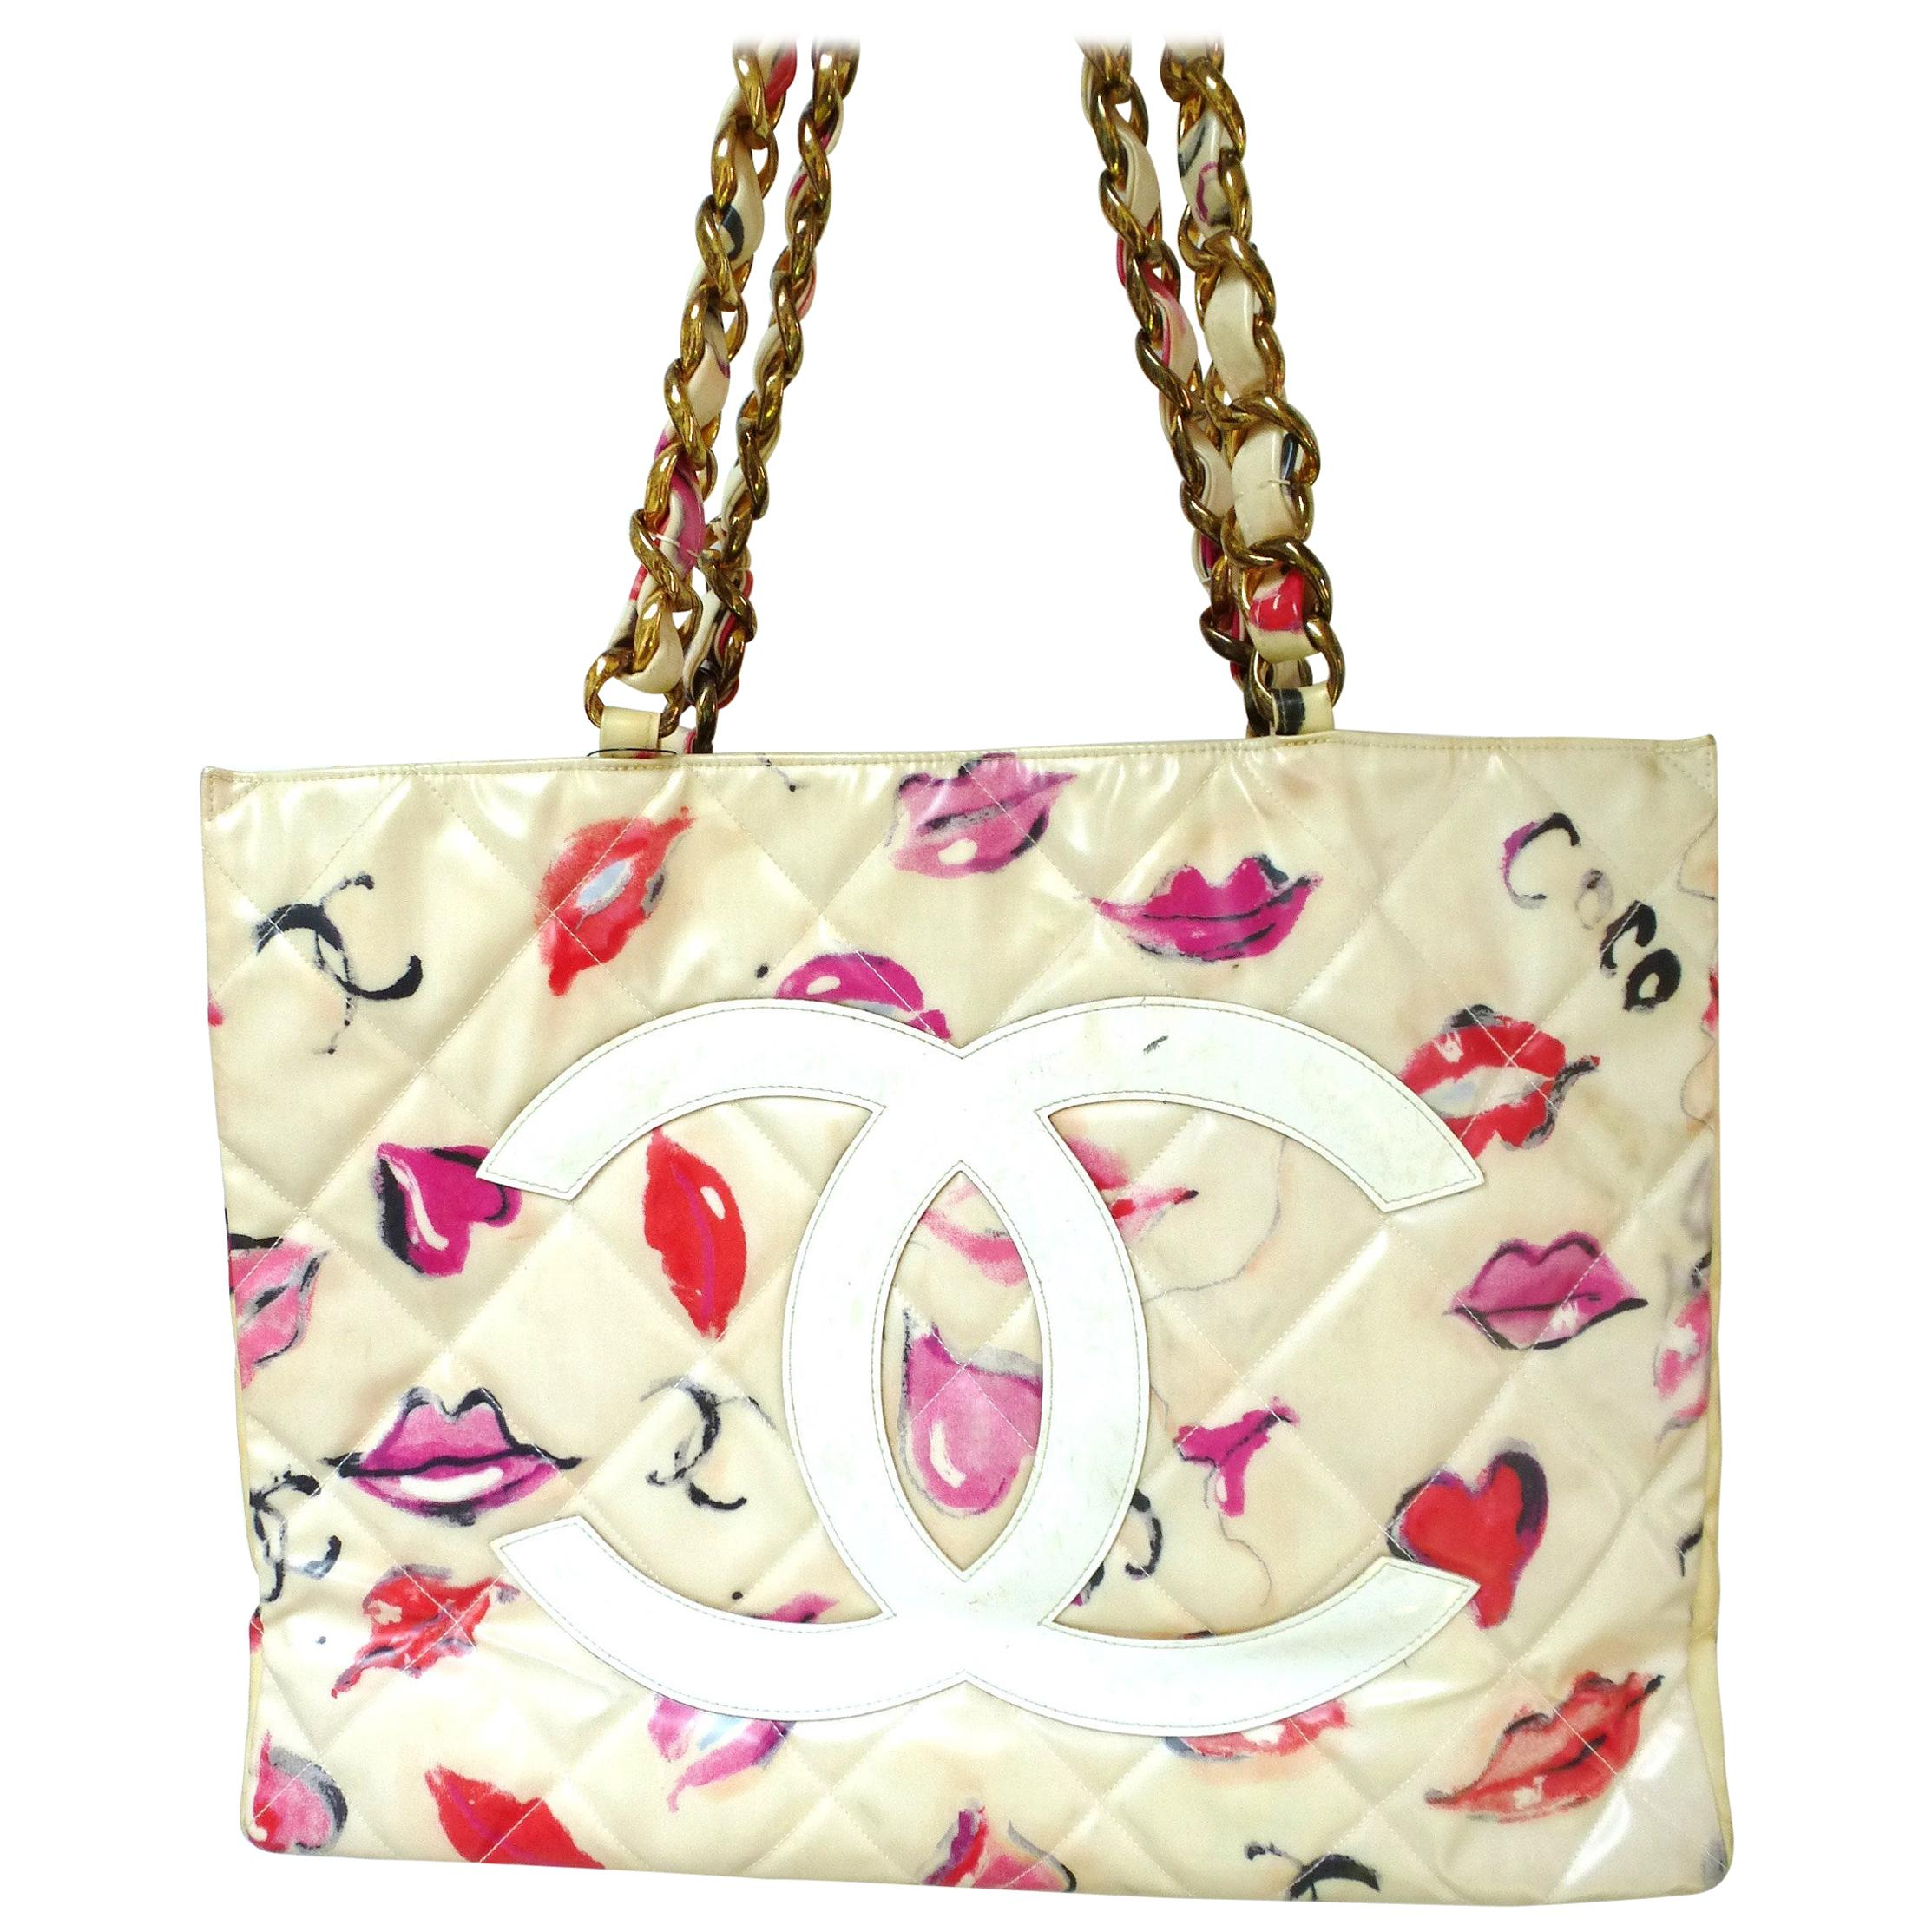 Chanel Jumbo nylon shopper Tot bag with Lip Heart + Coco Grafitti 1985's